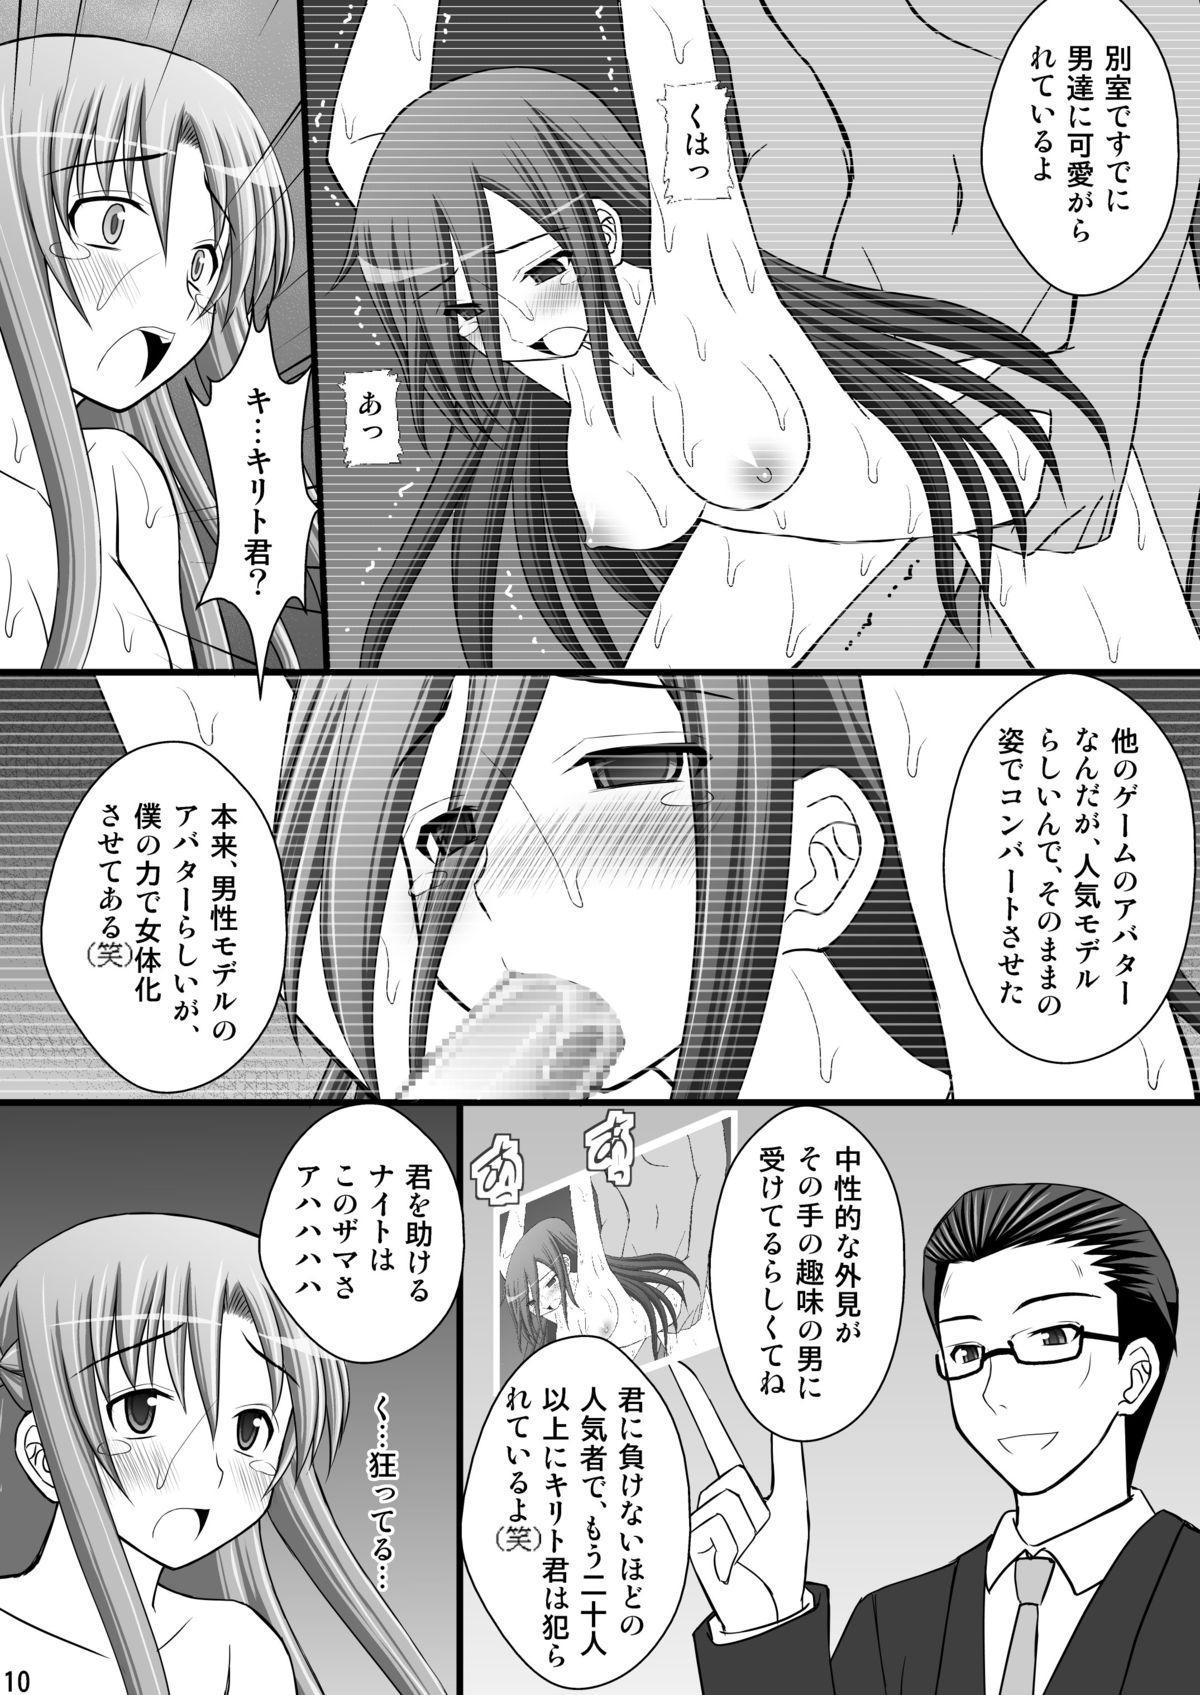 Toraware Hime II: Hostage Princess II 8